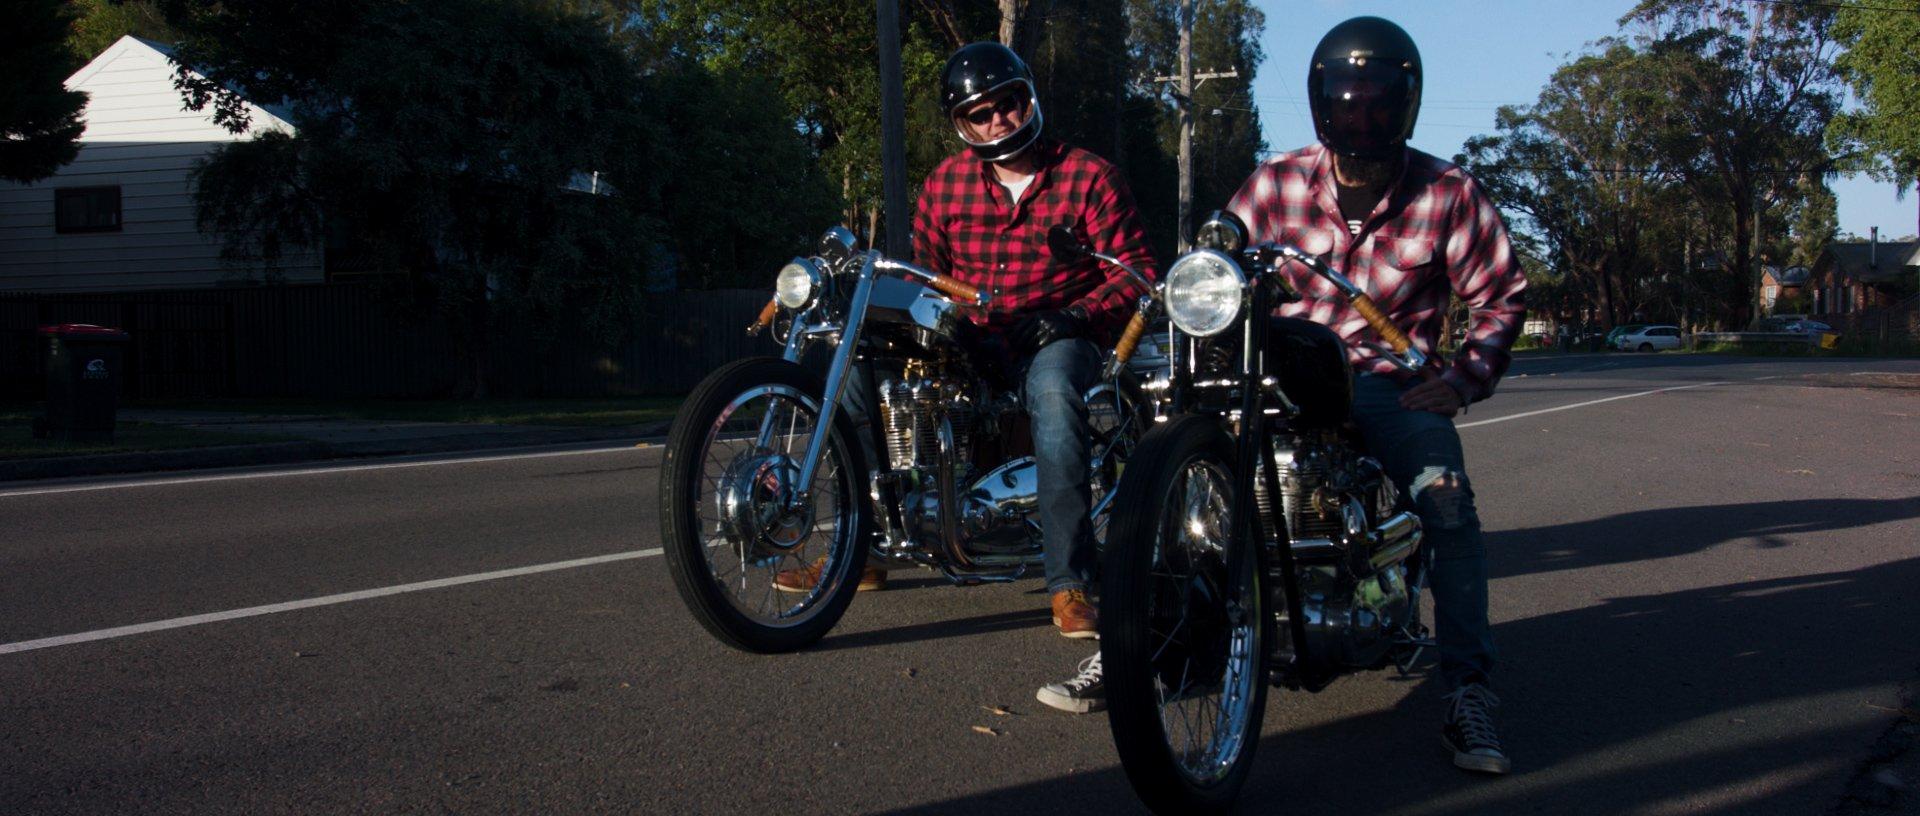 Chopper film custom motorcycle documentary